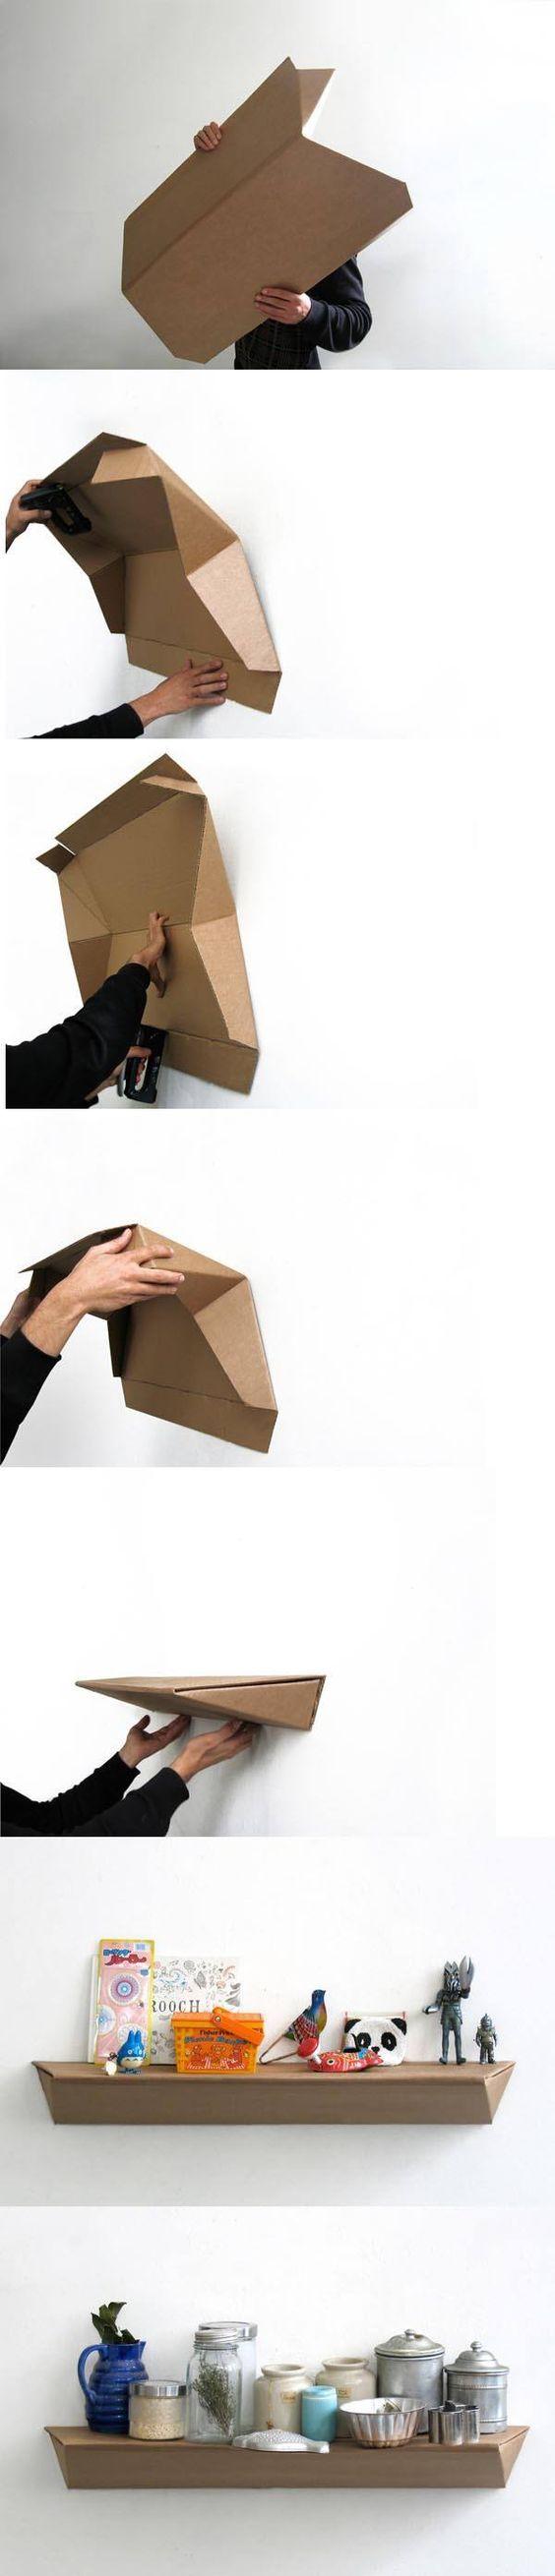 estanteria de carton diy ingenioso